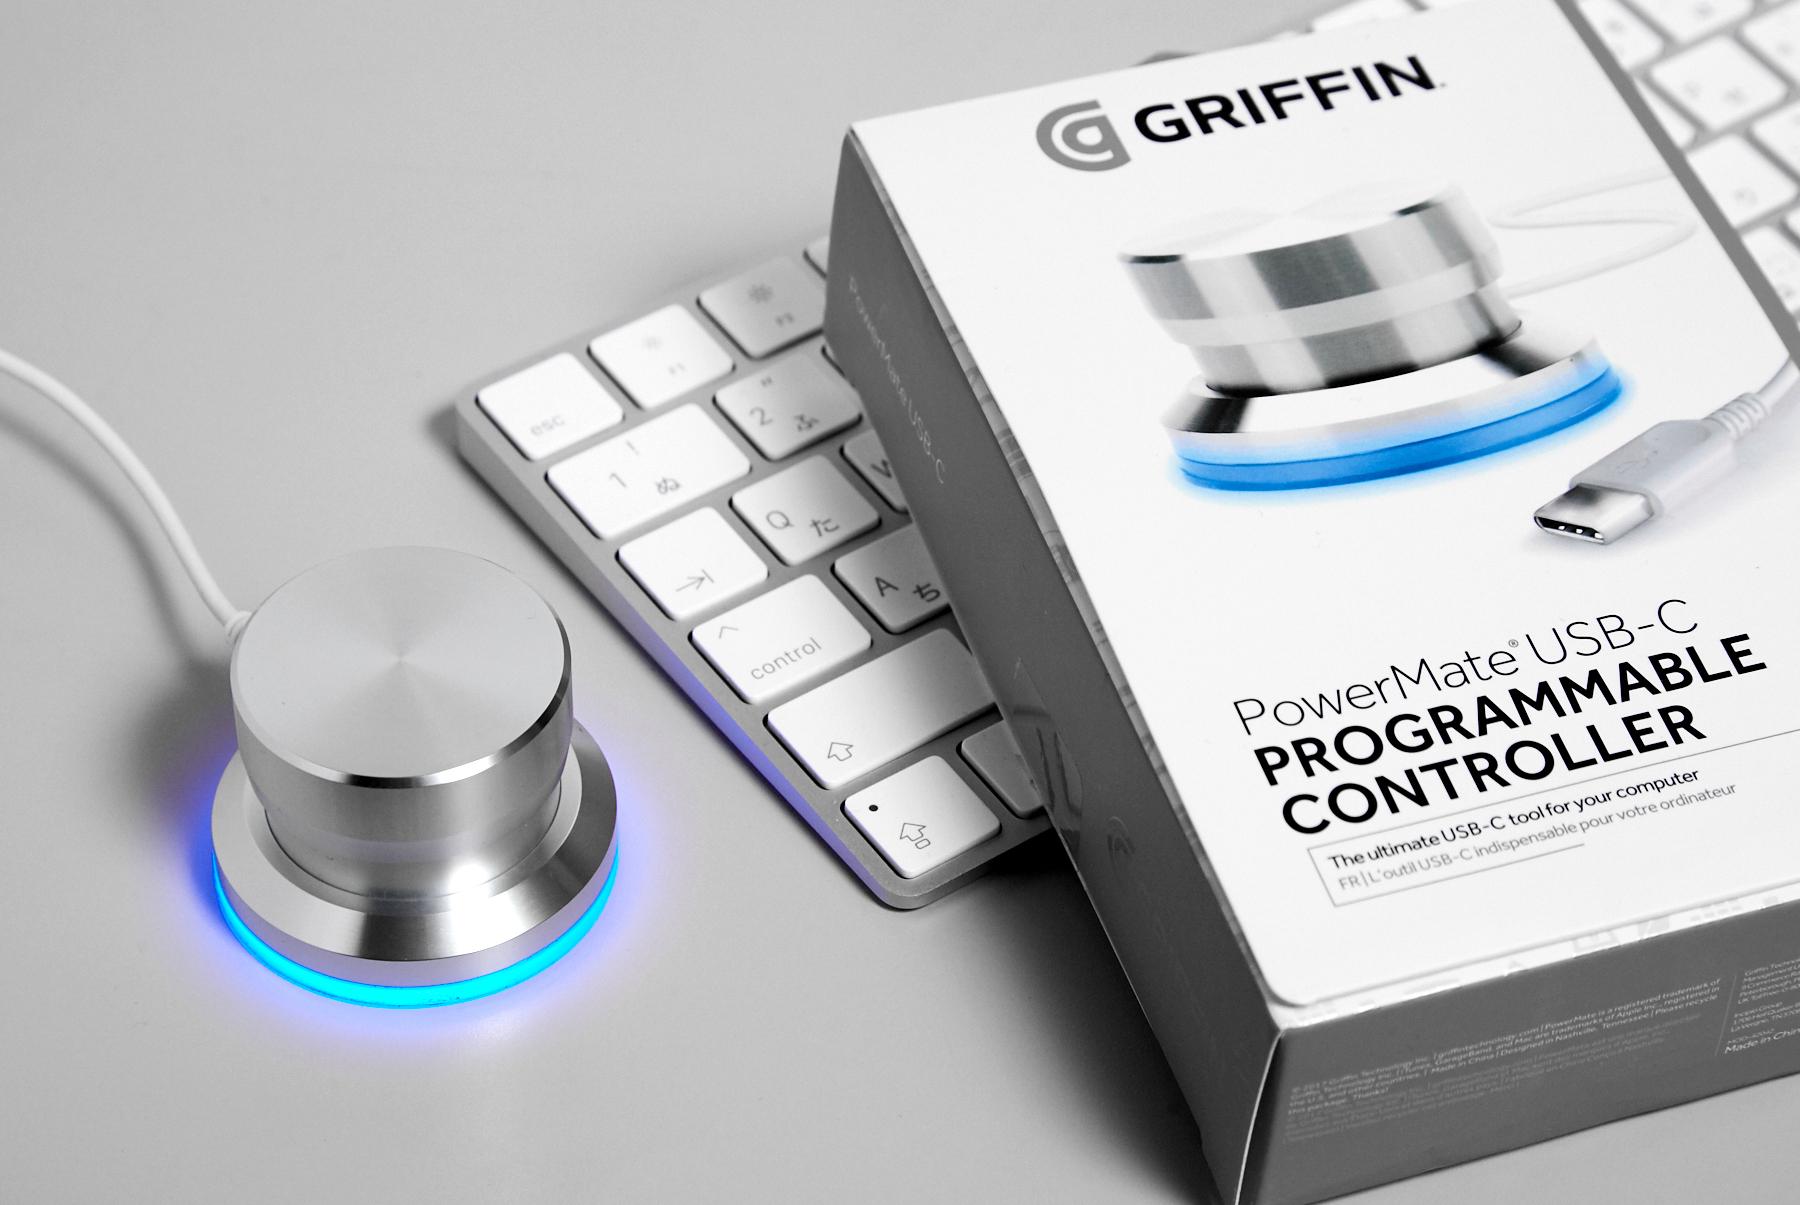 GRIFFIN PowerMate